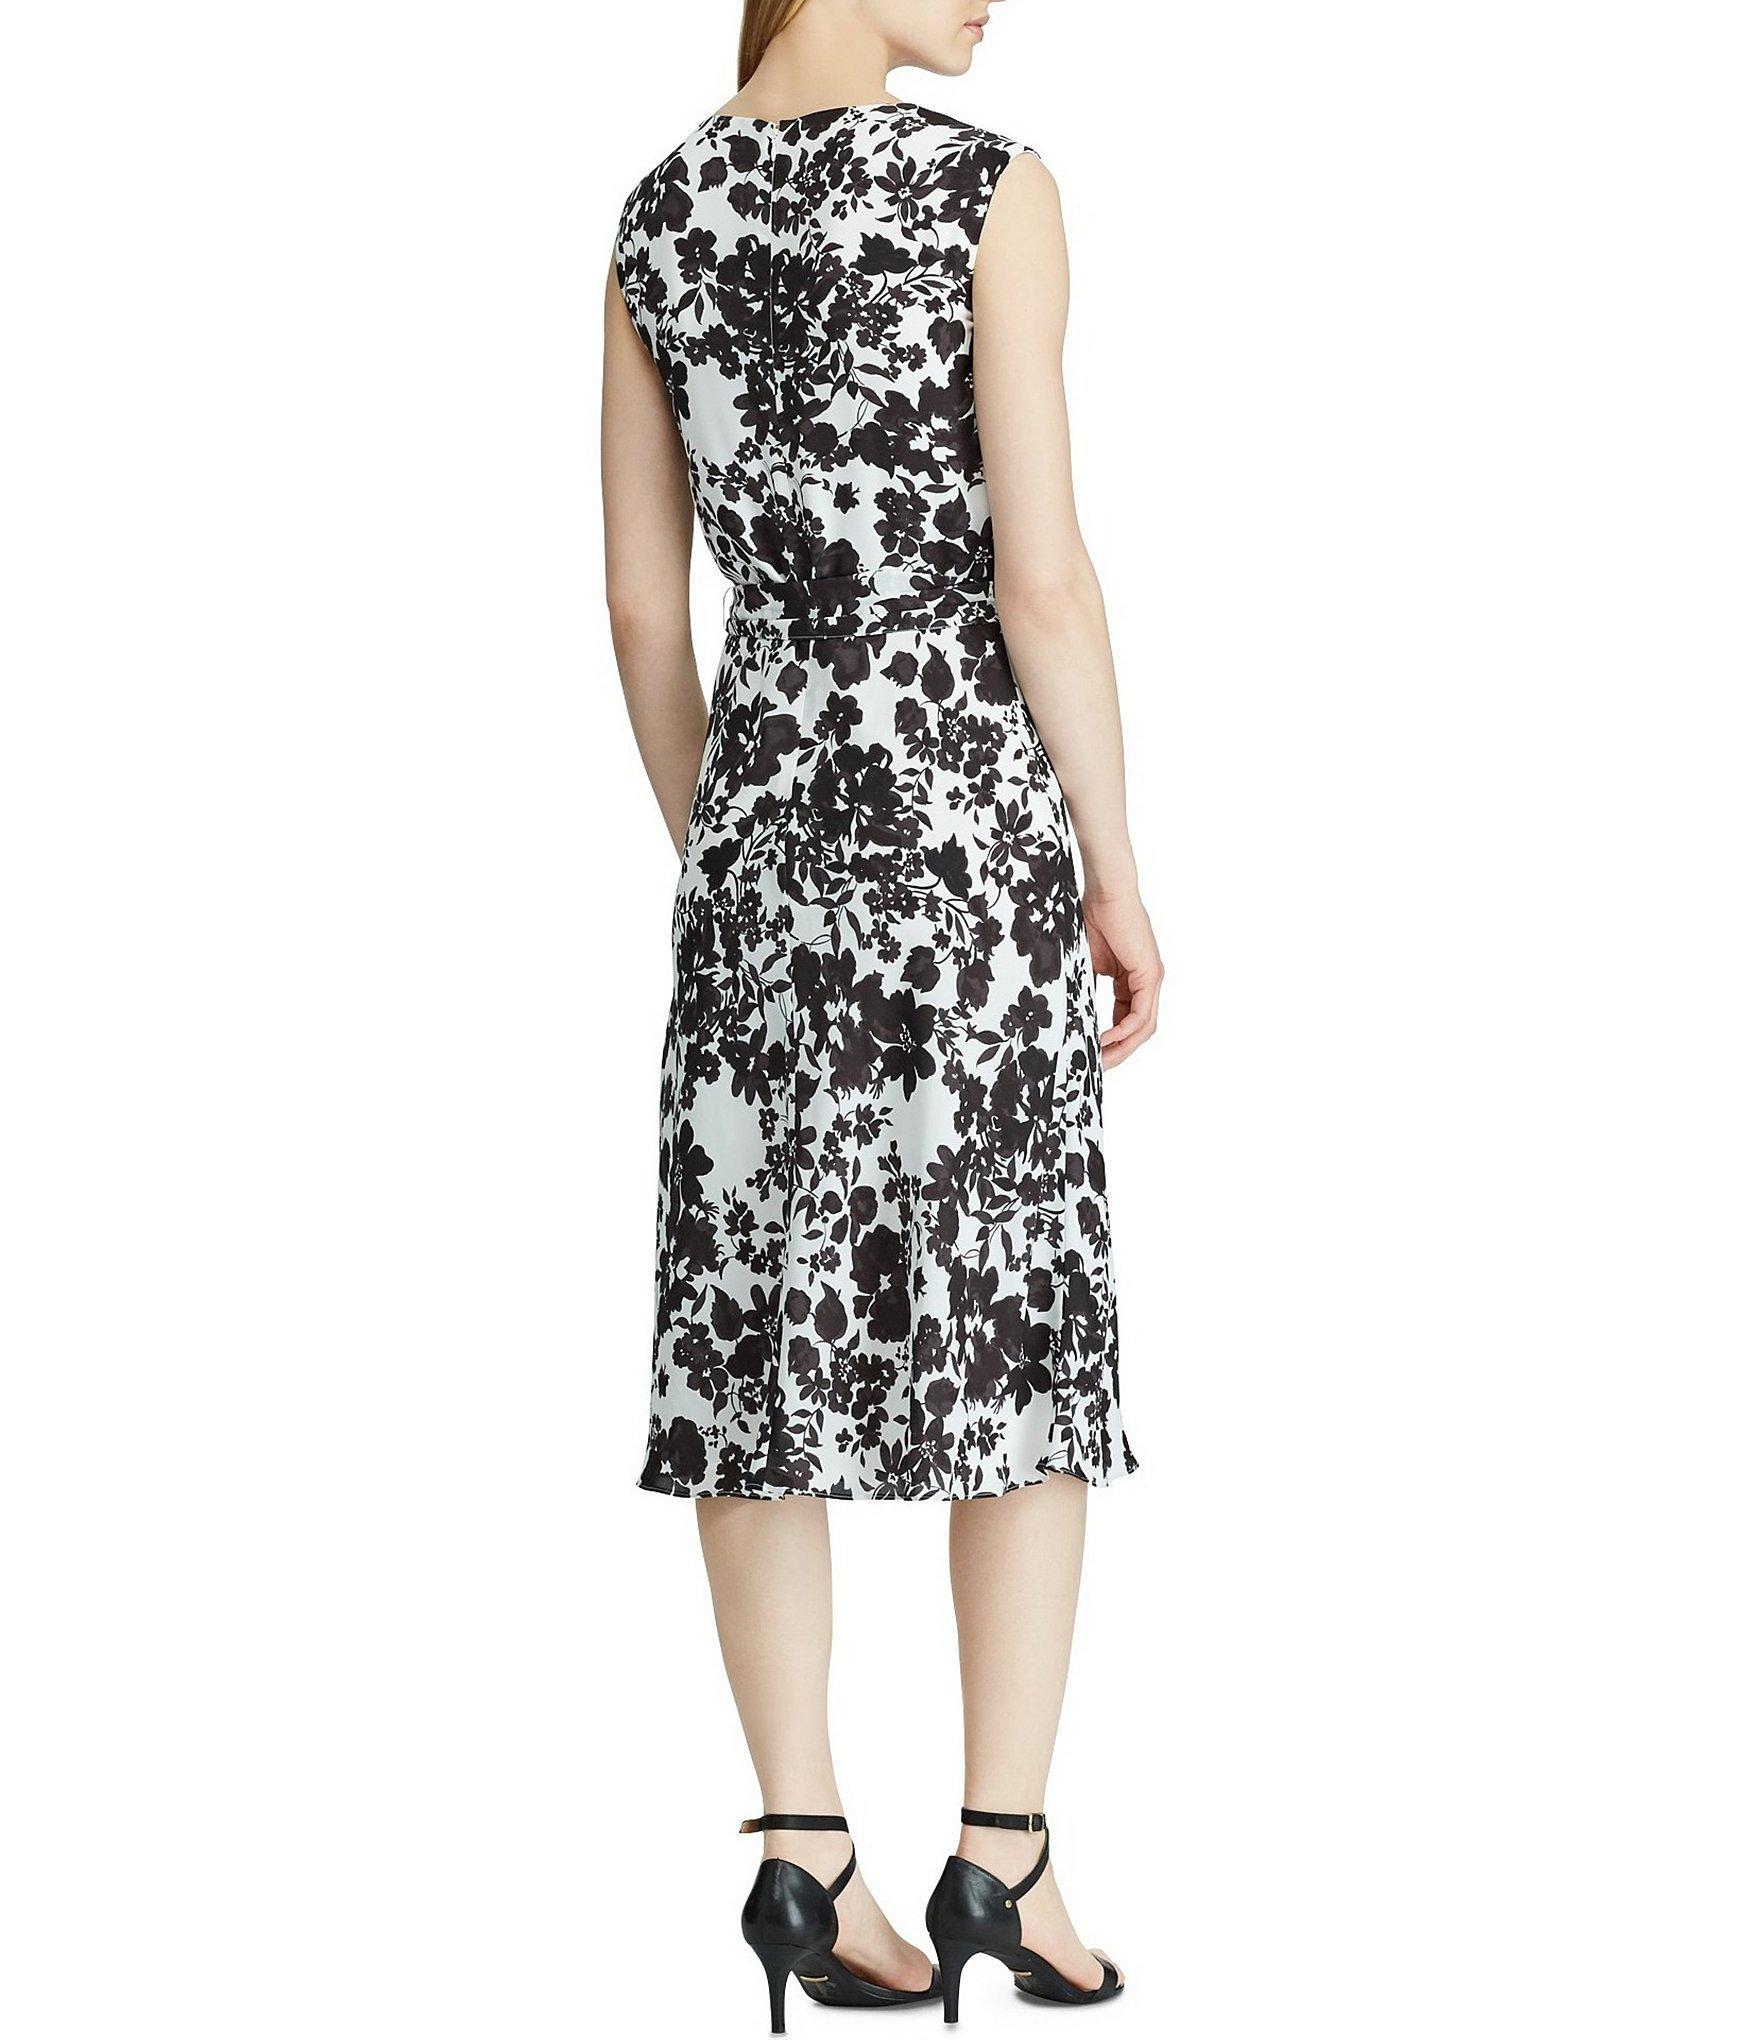 4af586659c9 Lyst - Lauren by Ralph Lauren Monotone Floral Print Sleeveless ...